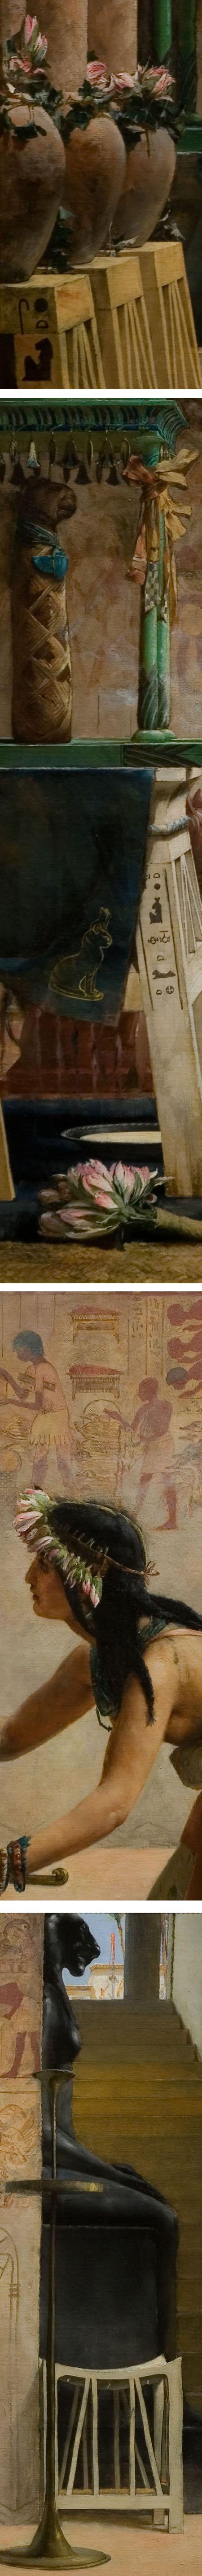 The Obsequies of an Egyptian Cat, John Reinhard Weguelin, 19th century Victorian painting (details)